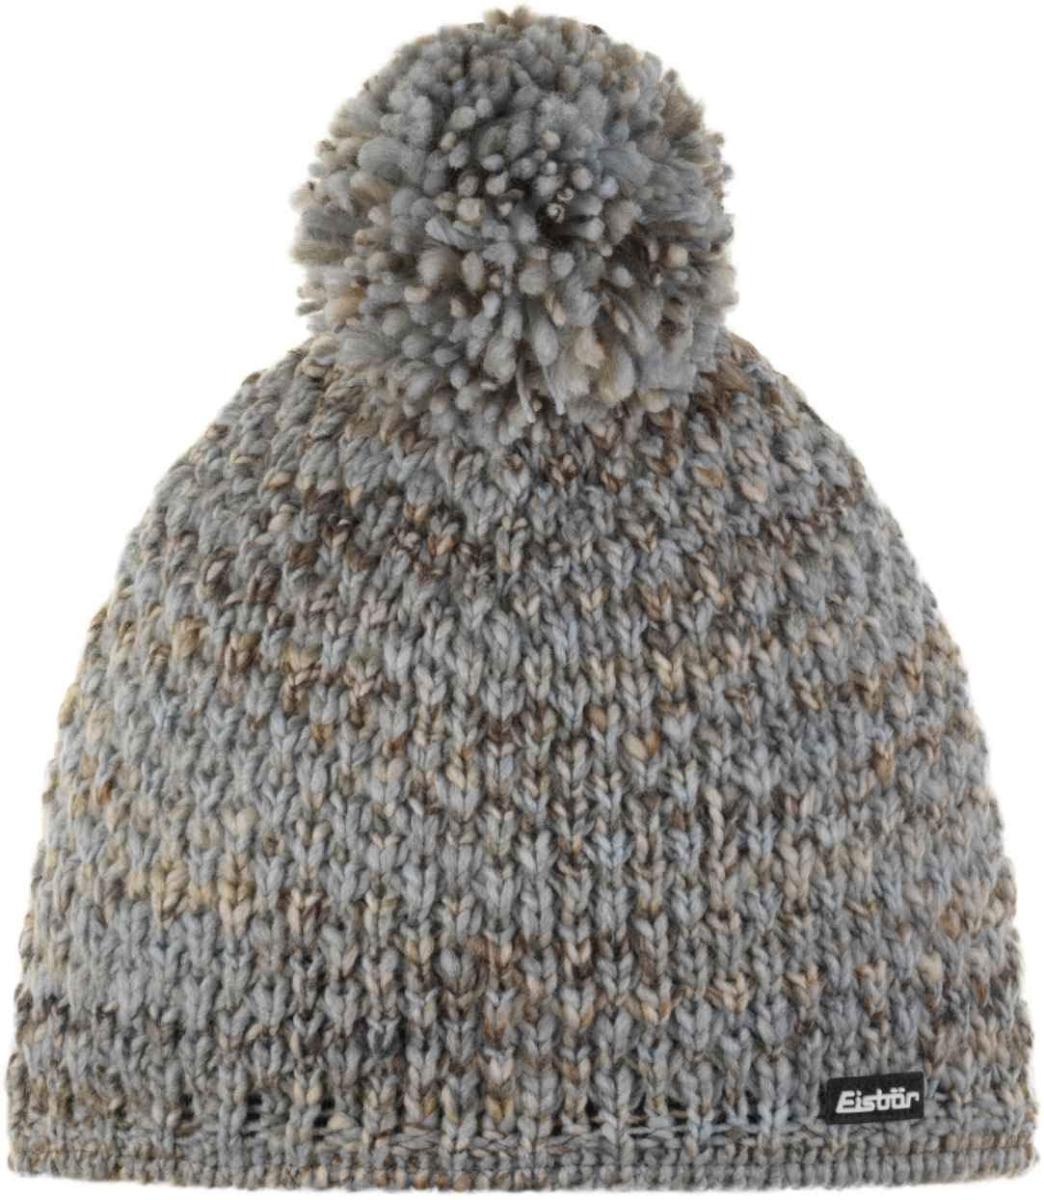 Eisbär Mütze Billie Pompon 30746 Fb.215